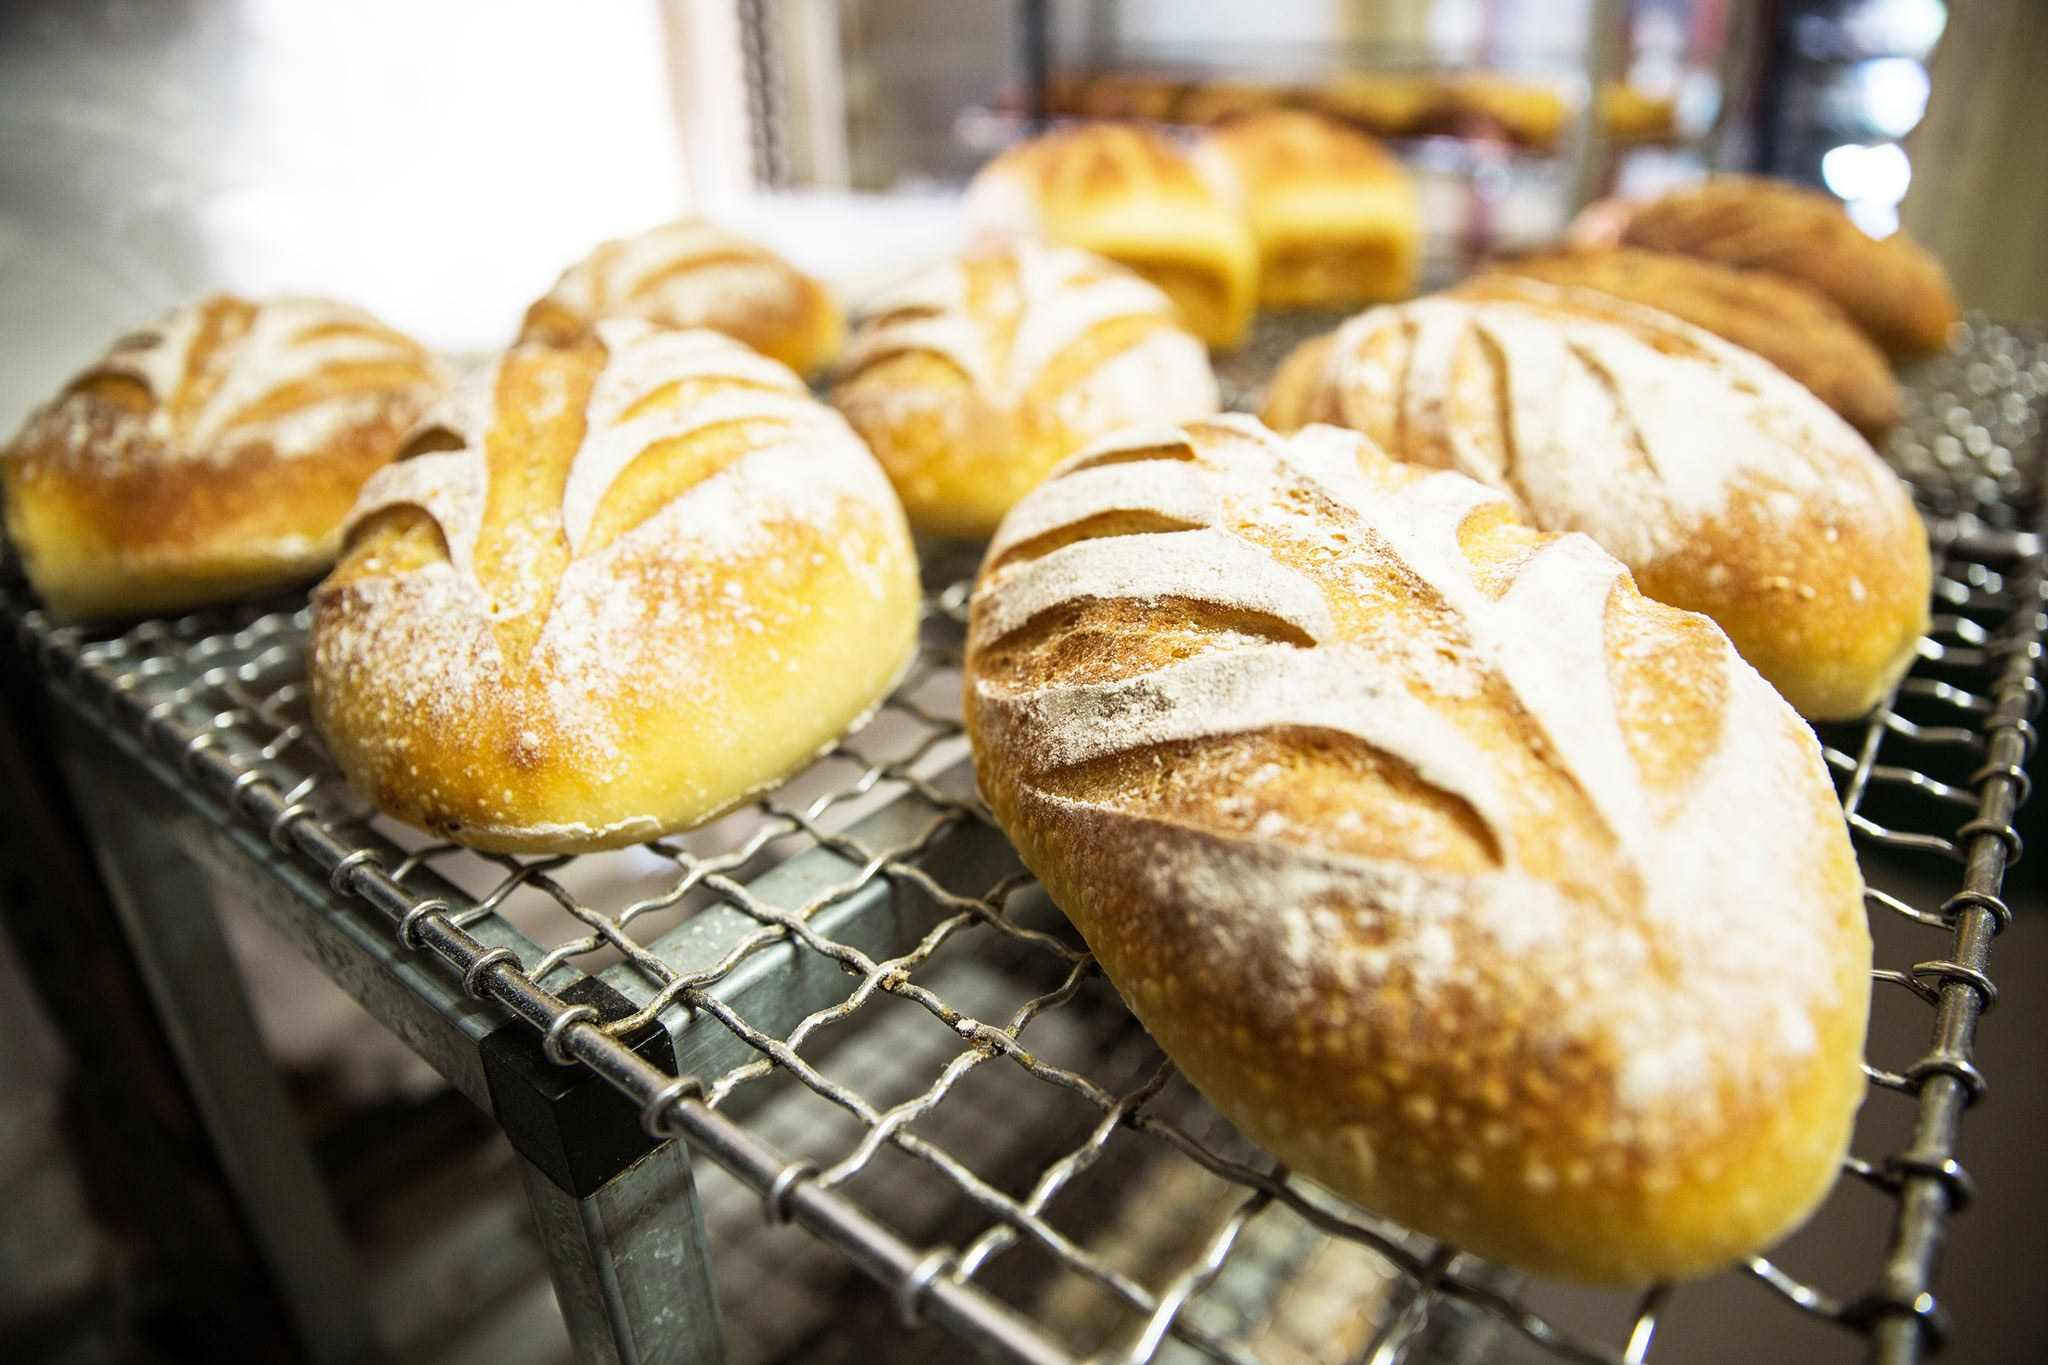 Perrymans bread